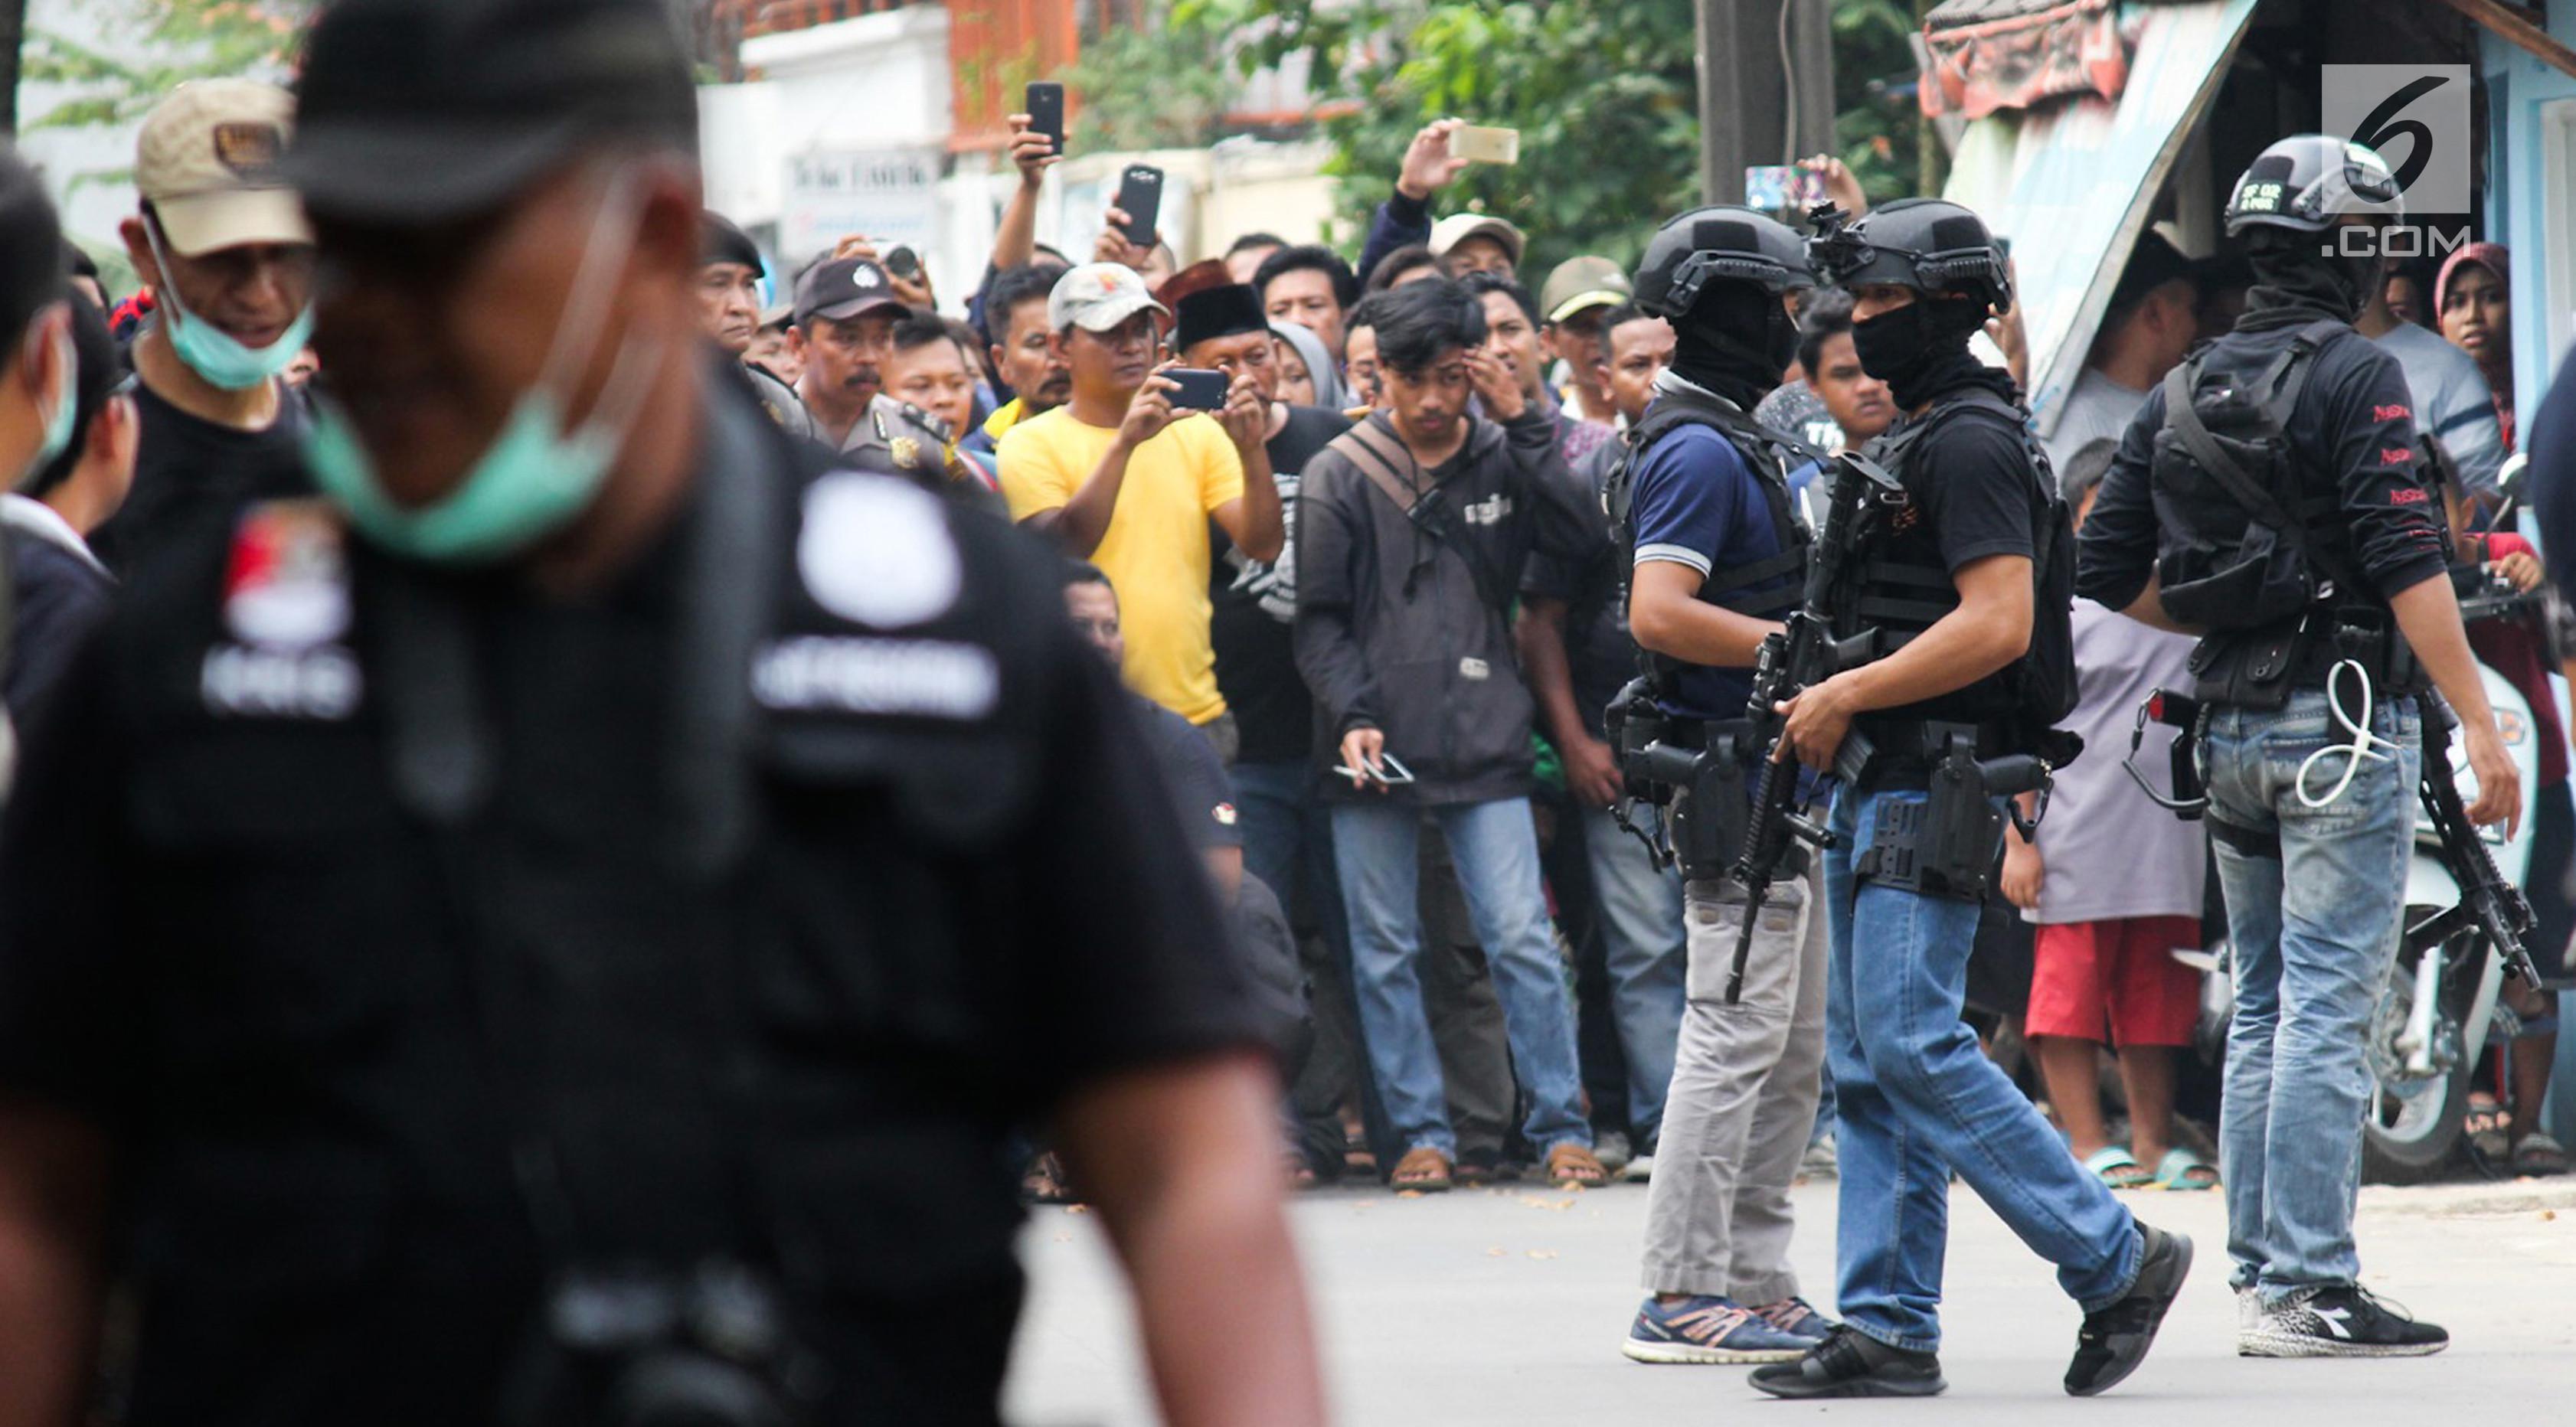 Warga antusias menyaksikan penggerebekan terduga teroris oleh Densus 88 Antiteror Mabes Polri di Jalan Gempol Raya, Kunciran Indah, Tangerang, Banten, Rabu (16/5). Warga dilarang mendekati lokasi saat penggerebekan terjadi. (Merdeka.com/Istimewa)